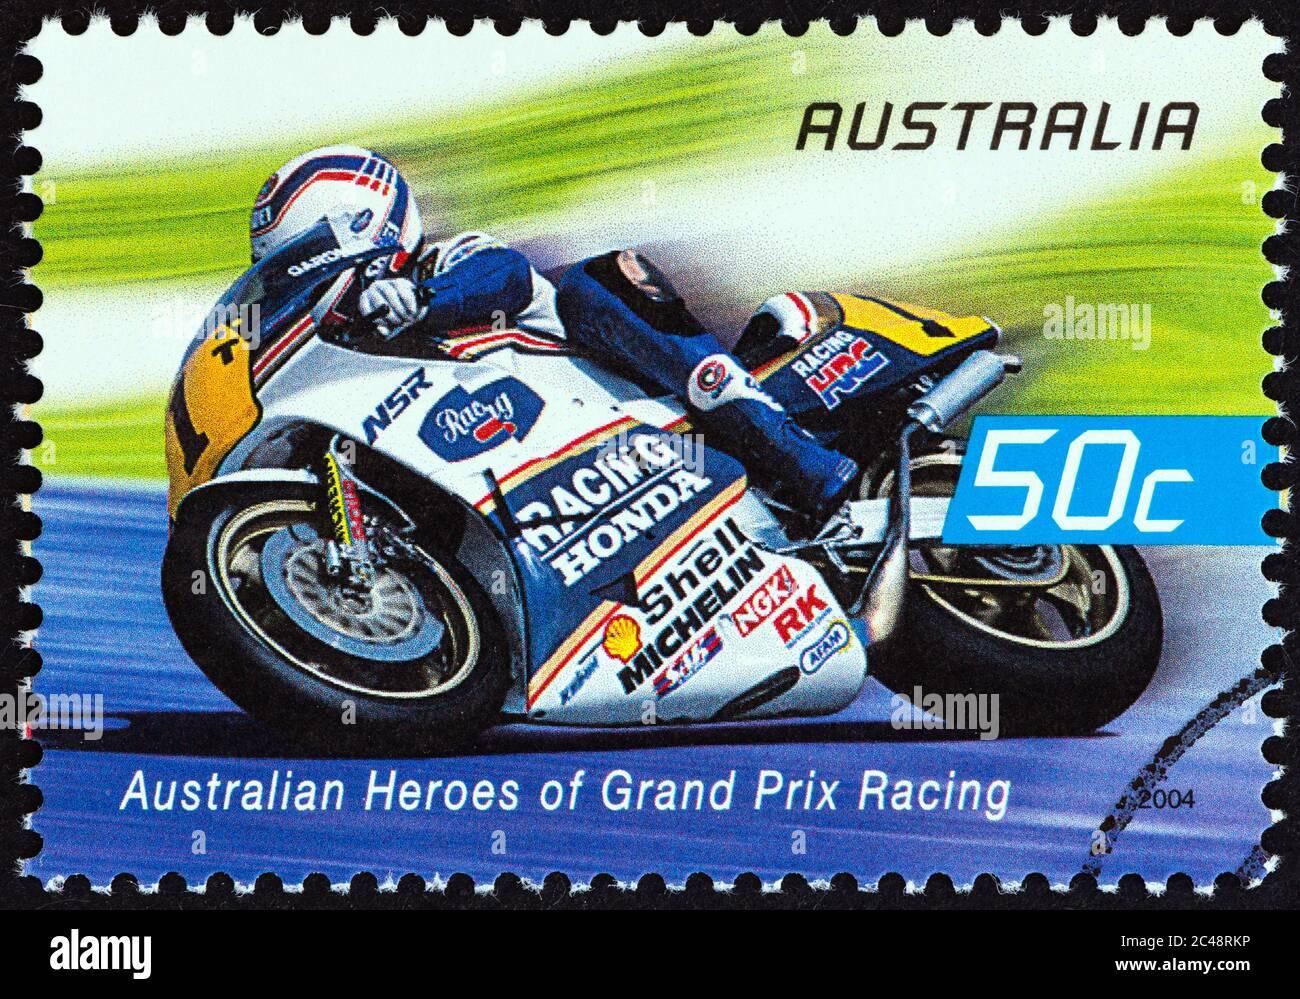 "AUSTRALIA - CIRCA 2004: A stamp printed in Australia from the ""Australian Heroes of Grand Prix Racing"" issue shows Wayne Gardner (Rothmans Honda) Stock Photo"